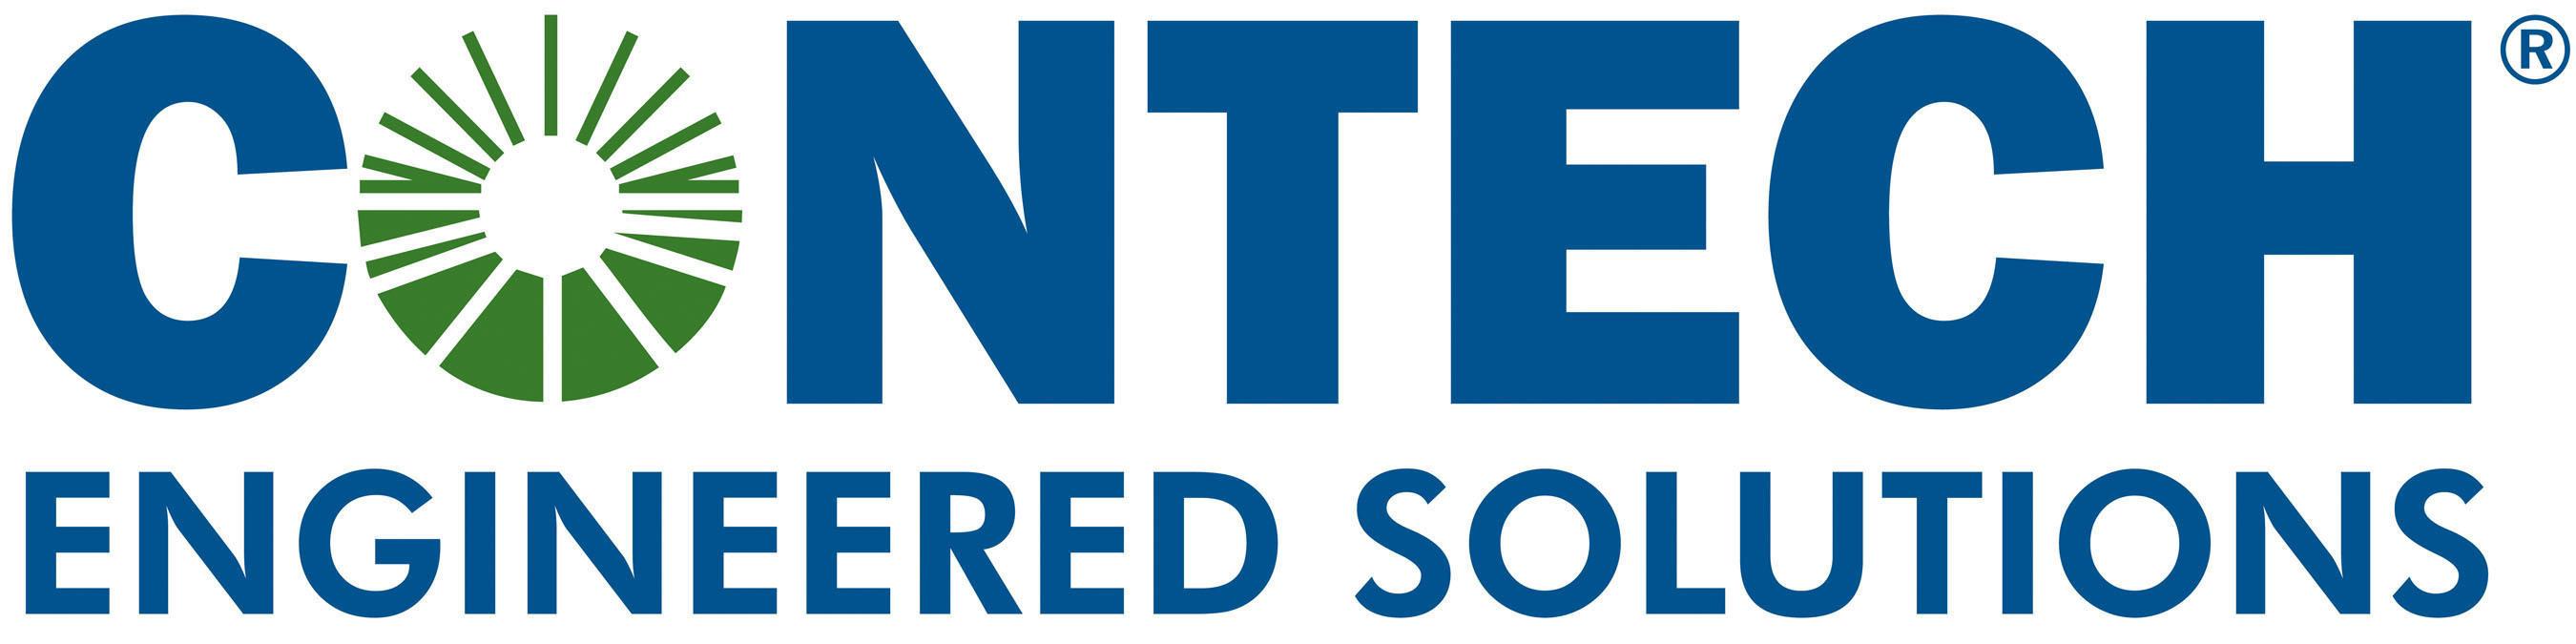 Contech Engineered Solutions logo.